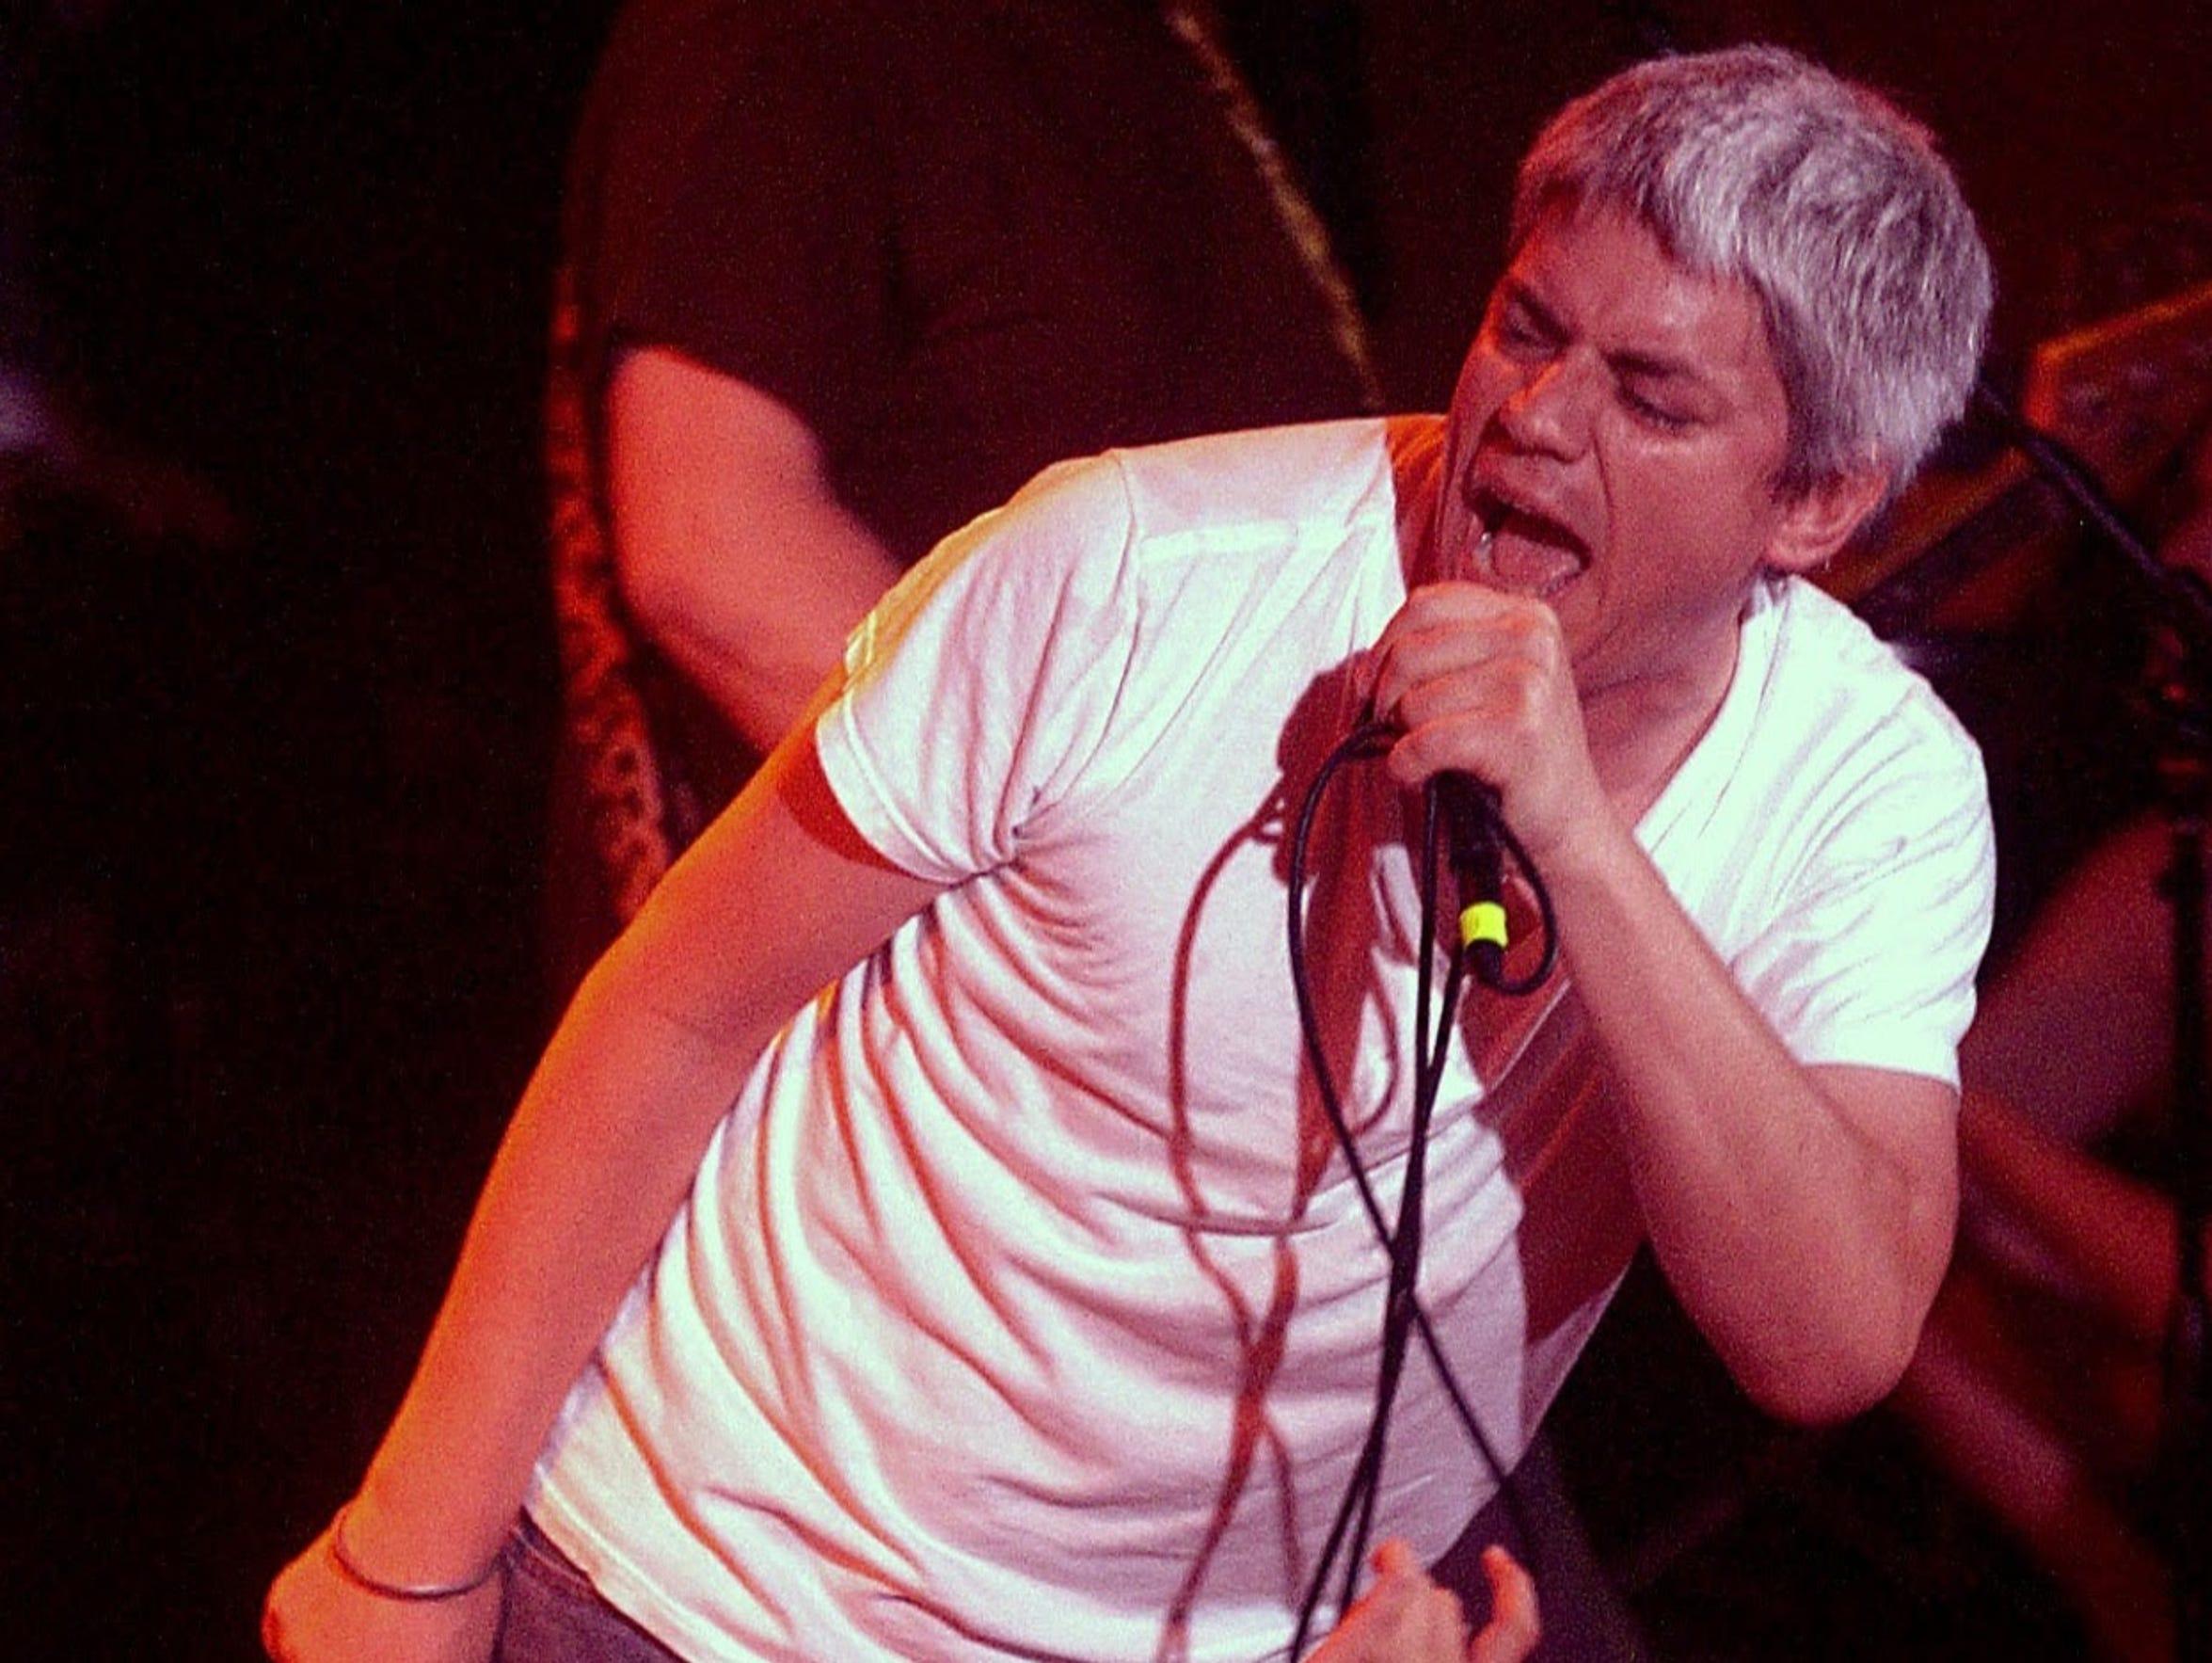 Paul Mahern is seen during a 2005 Zero Boys reunion